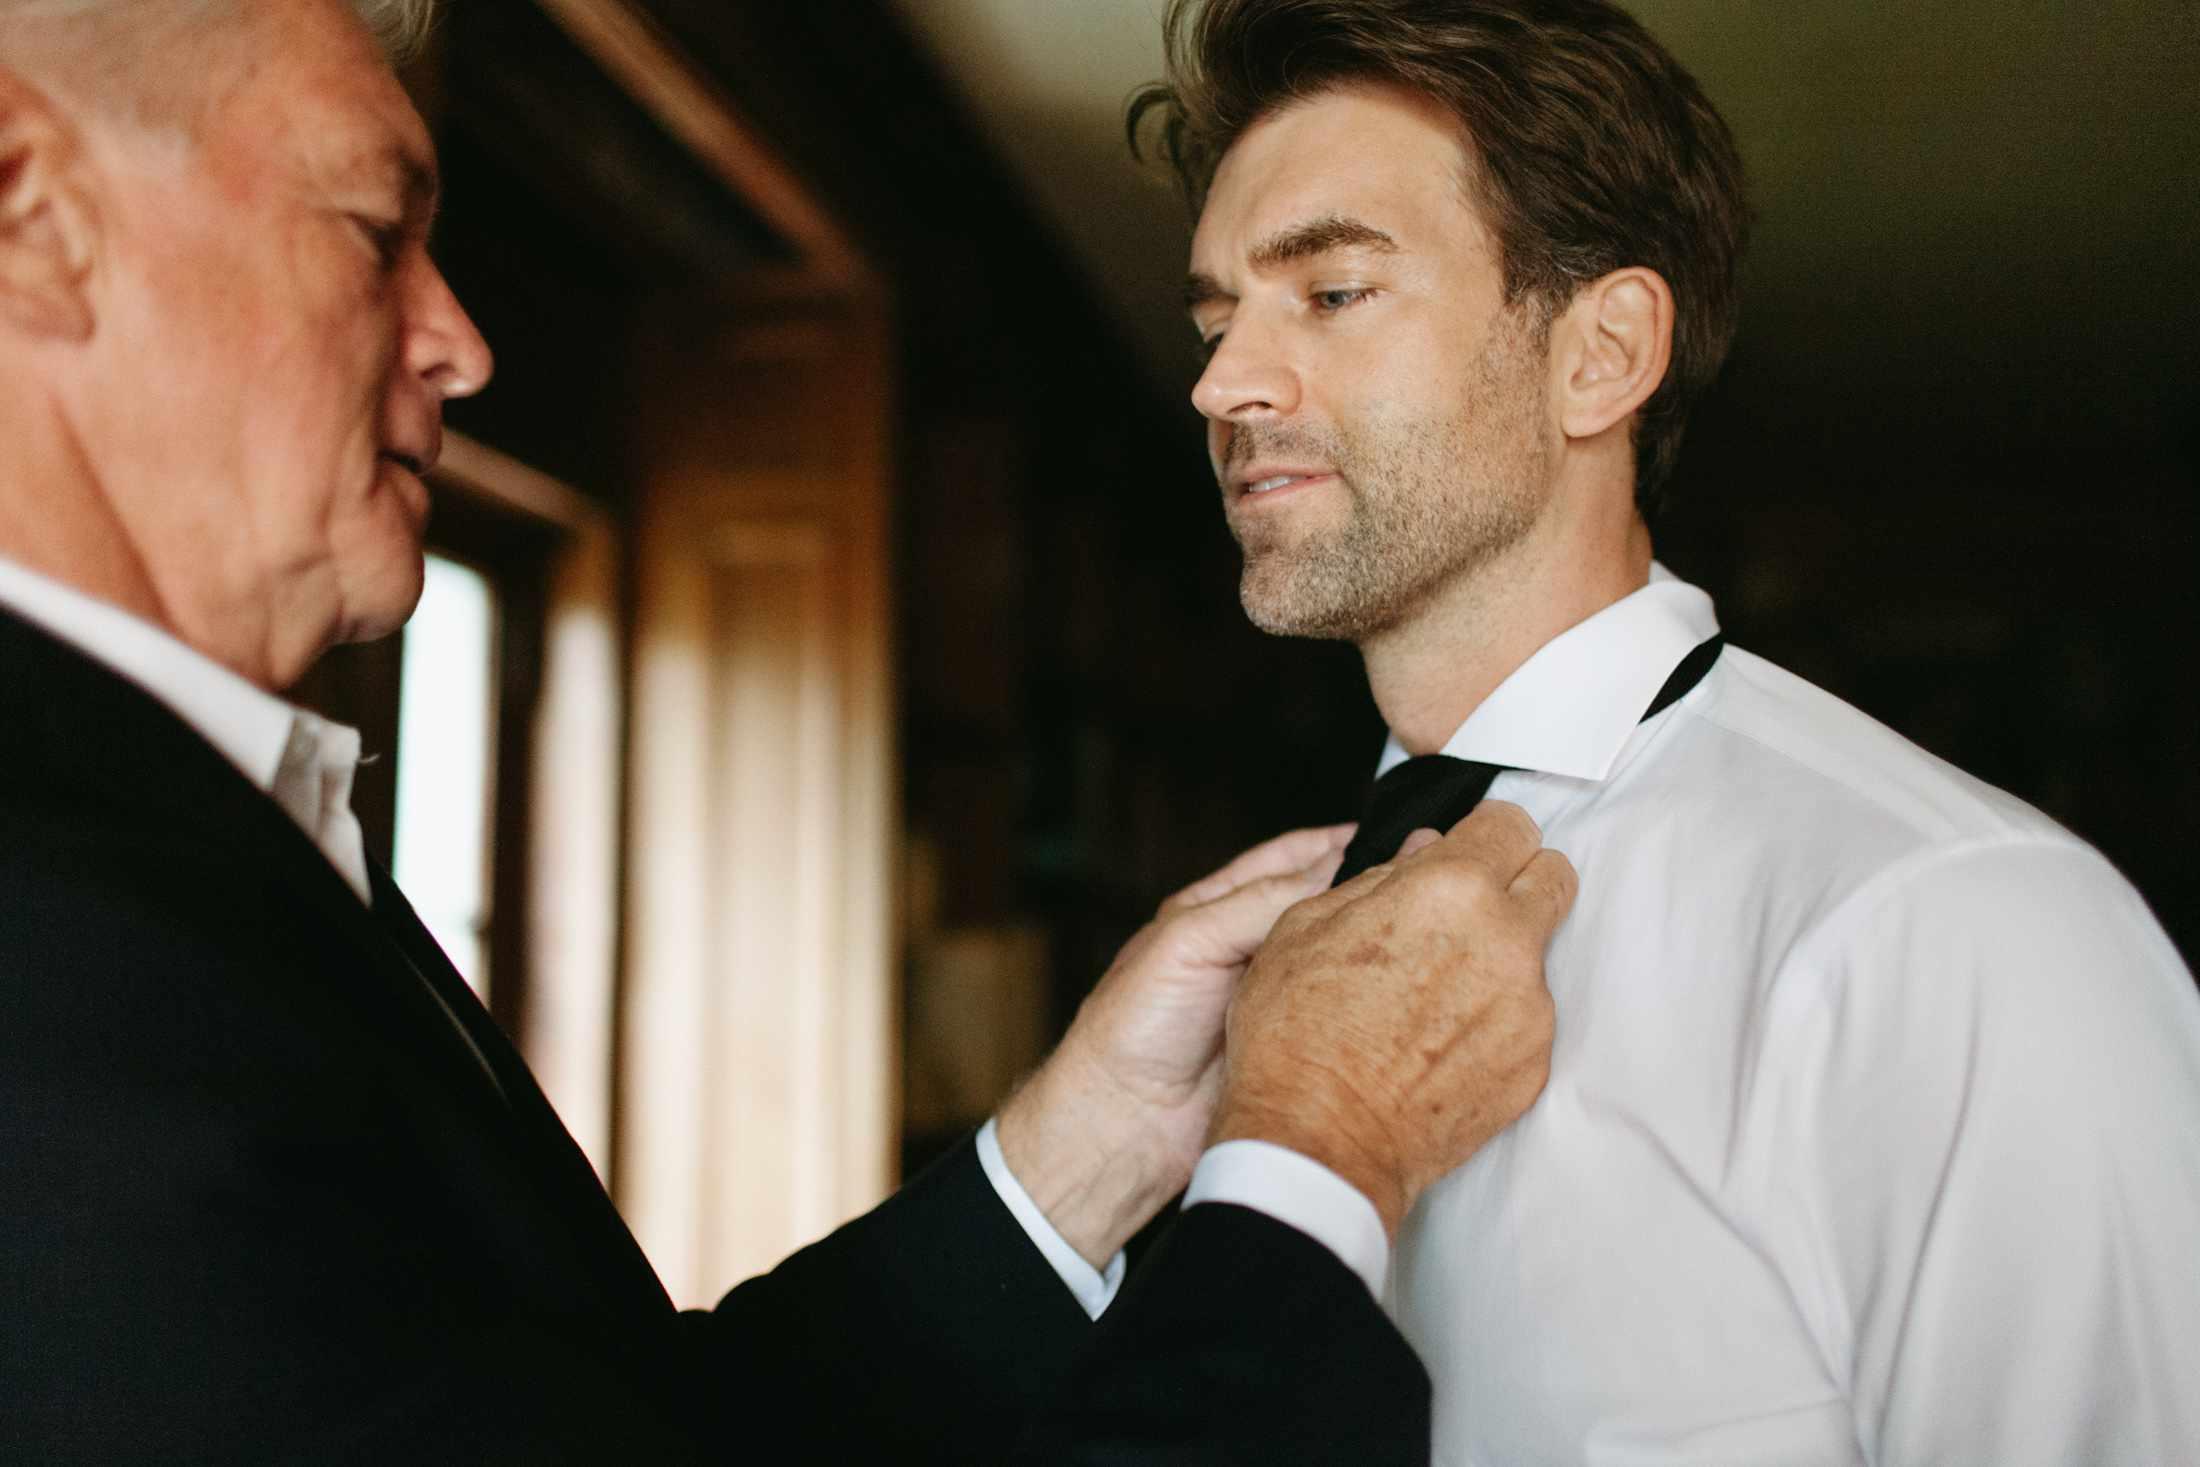 Dad Tying the Tie